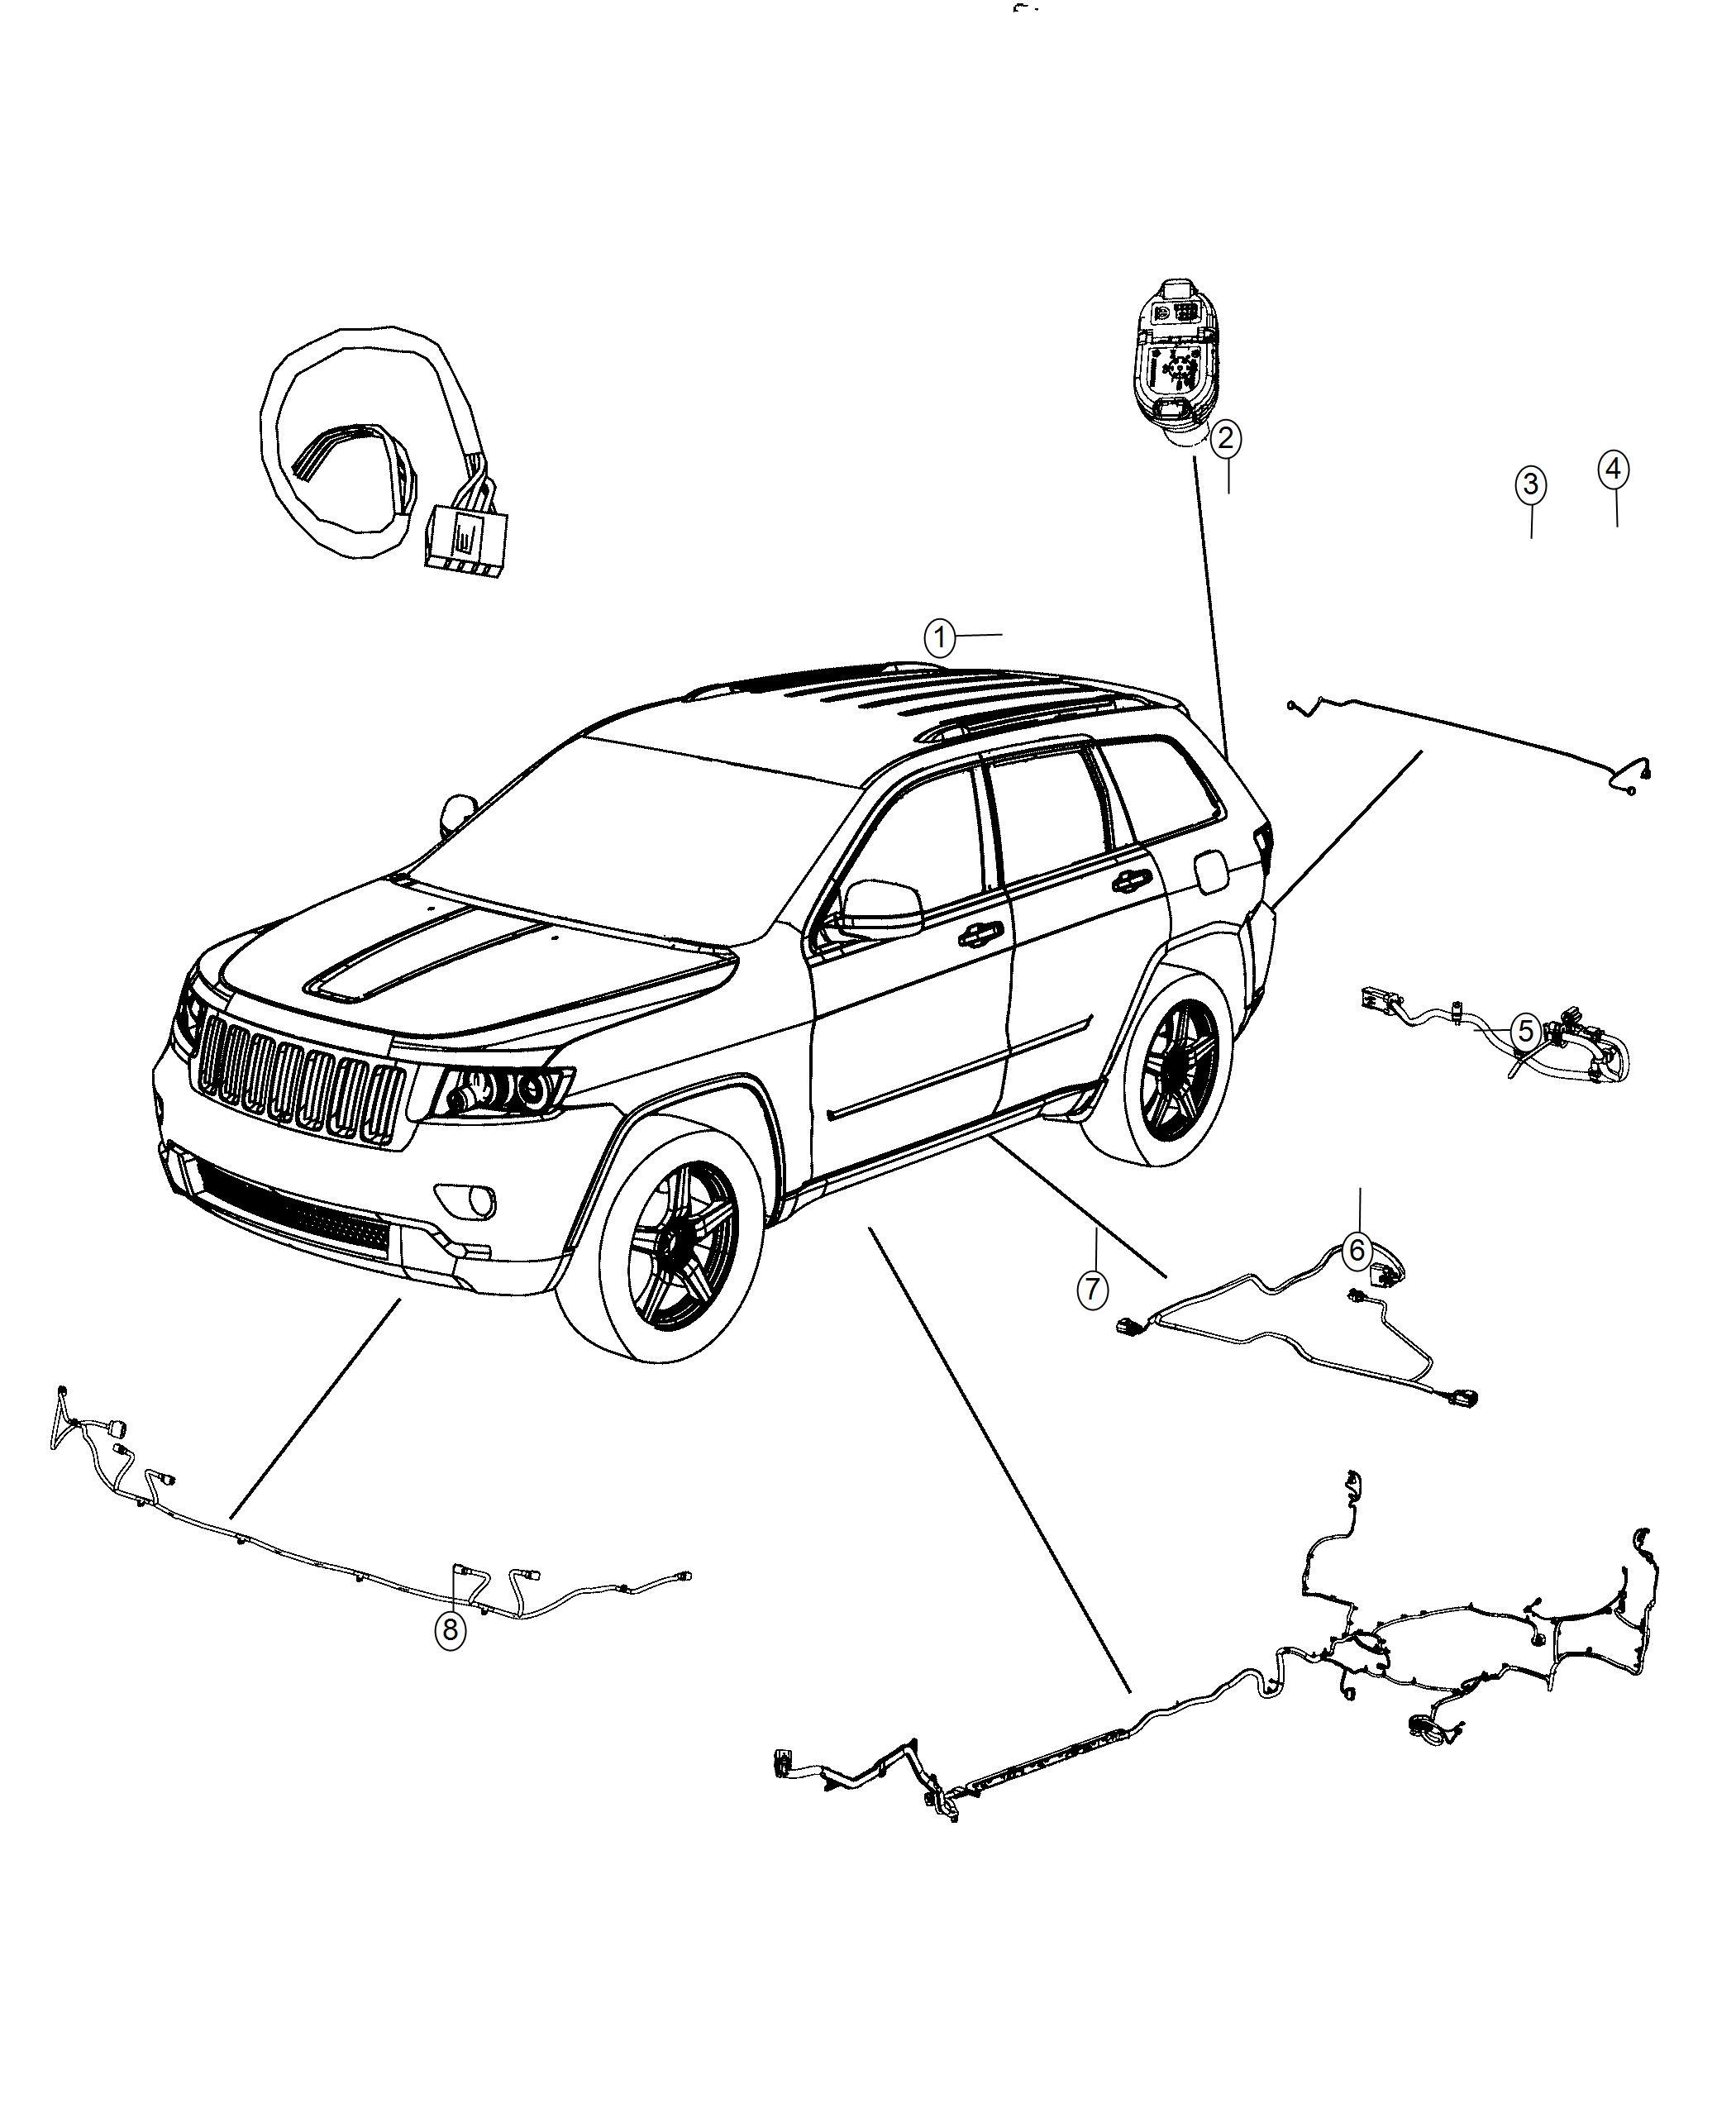 Jeep Grand Cherokee Wiring  Underbody  Export